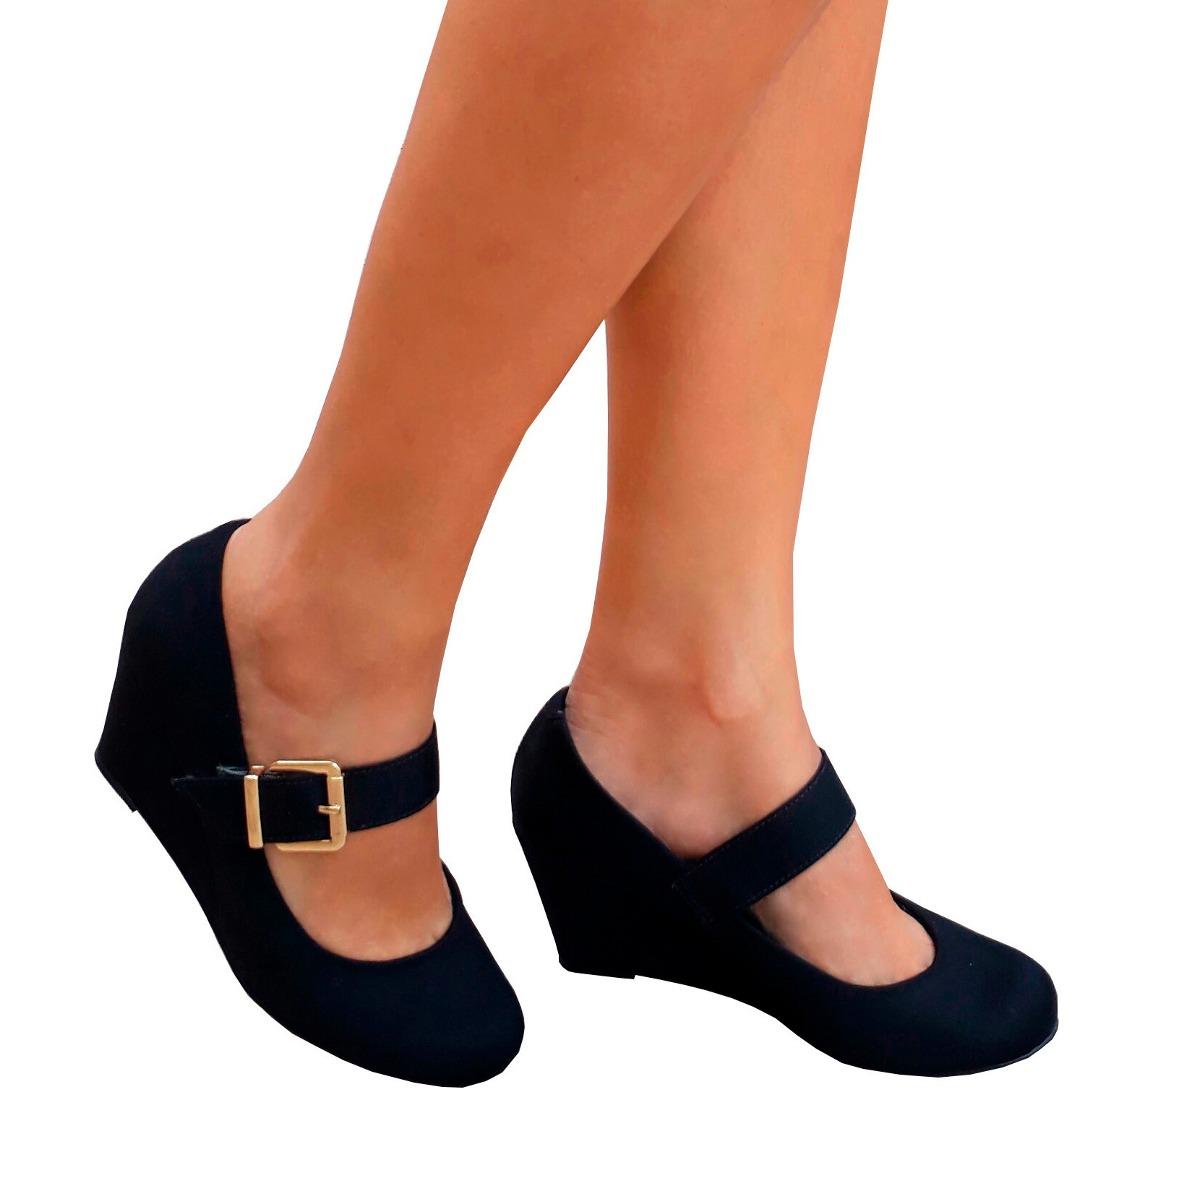 058c6fcb6c sapato boneca preto feminino salto medio baixo social moleca. Carregando  zoom.